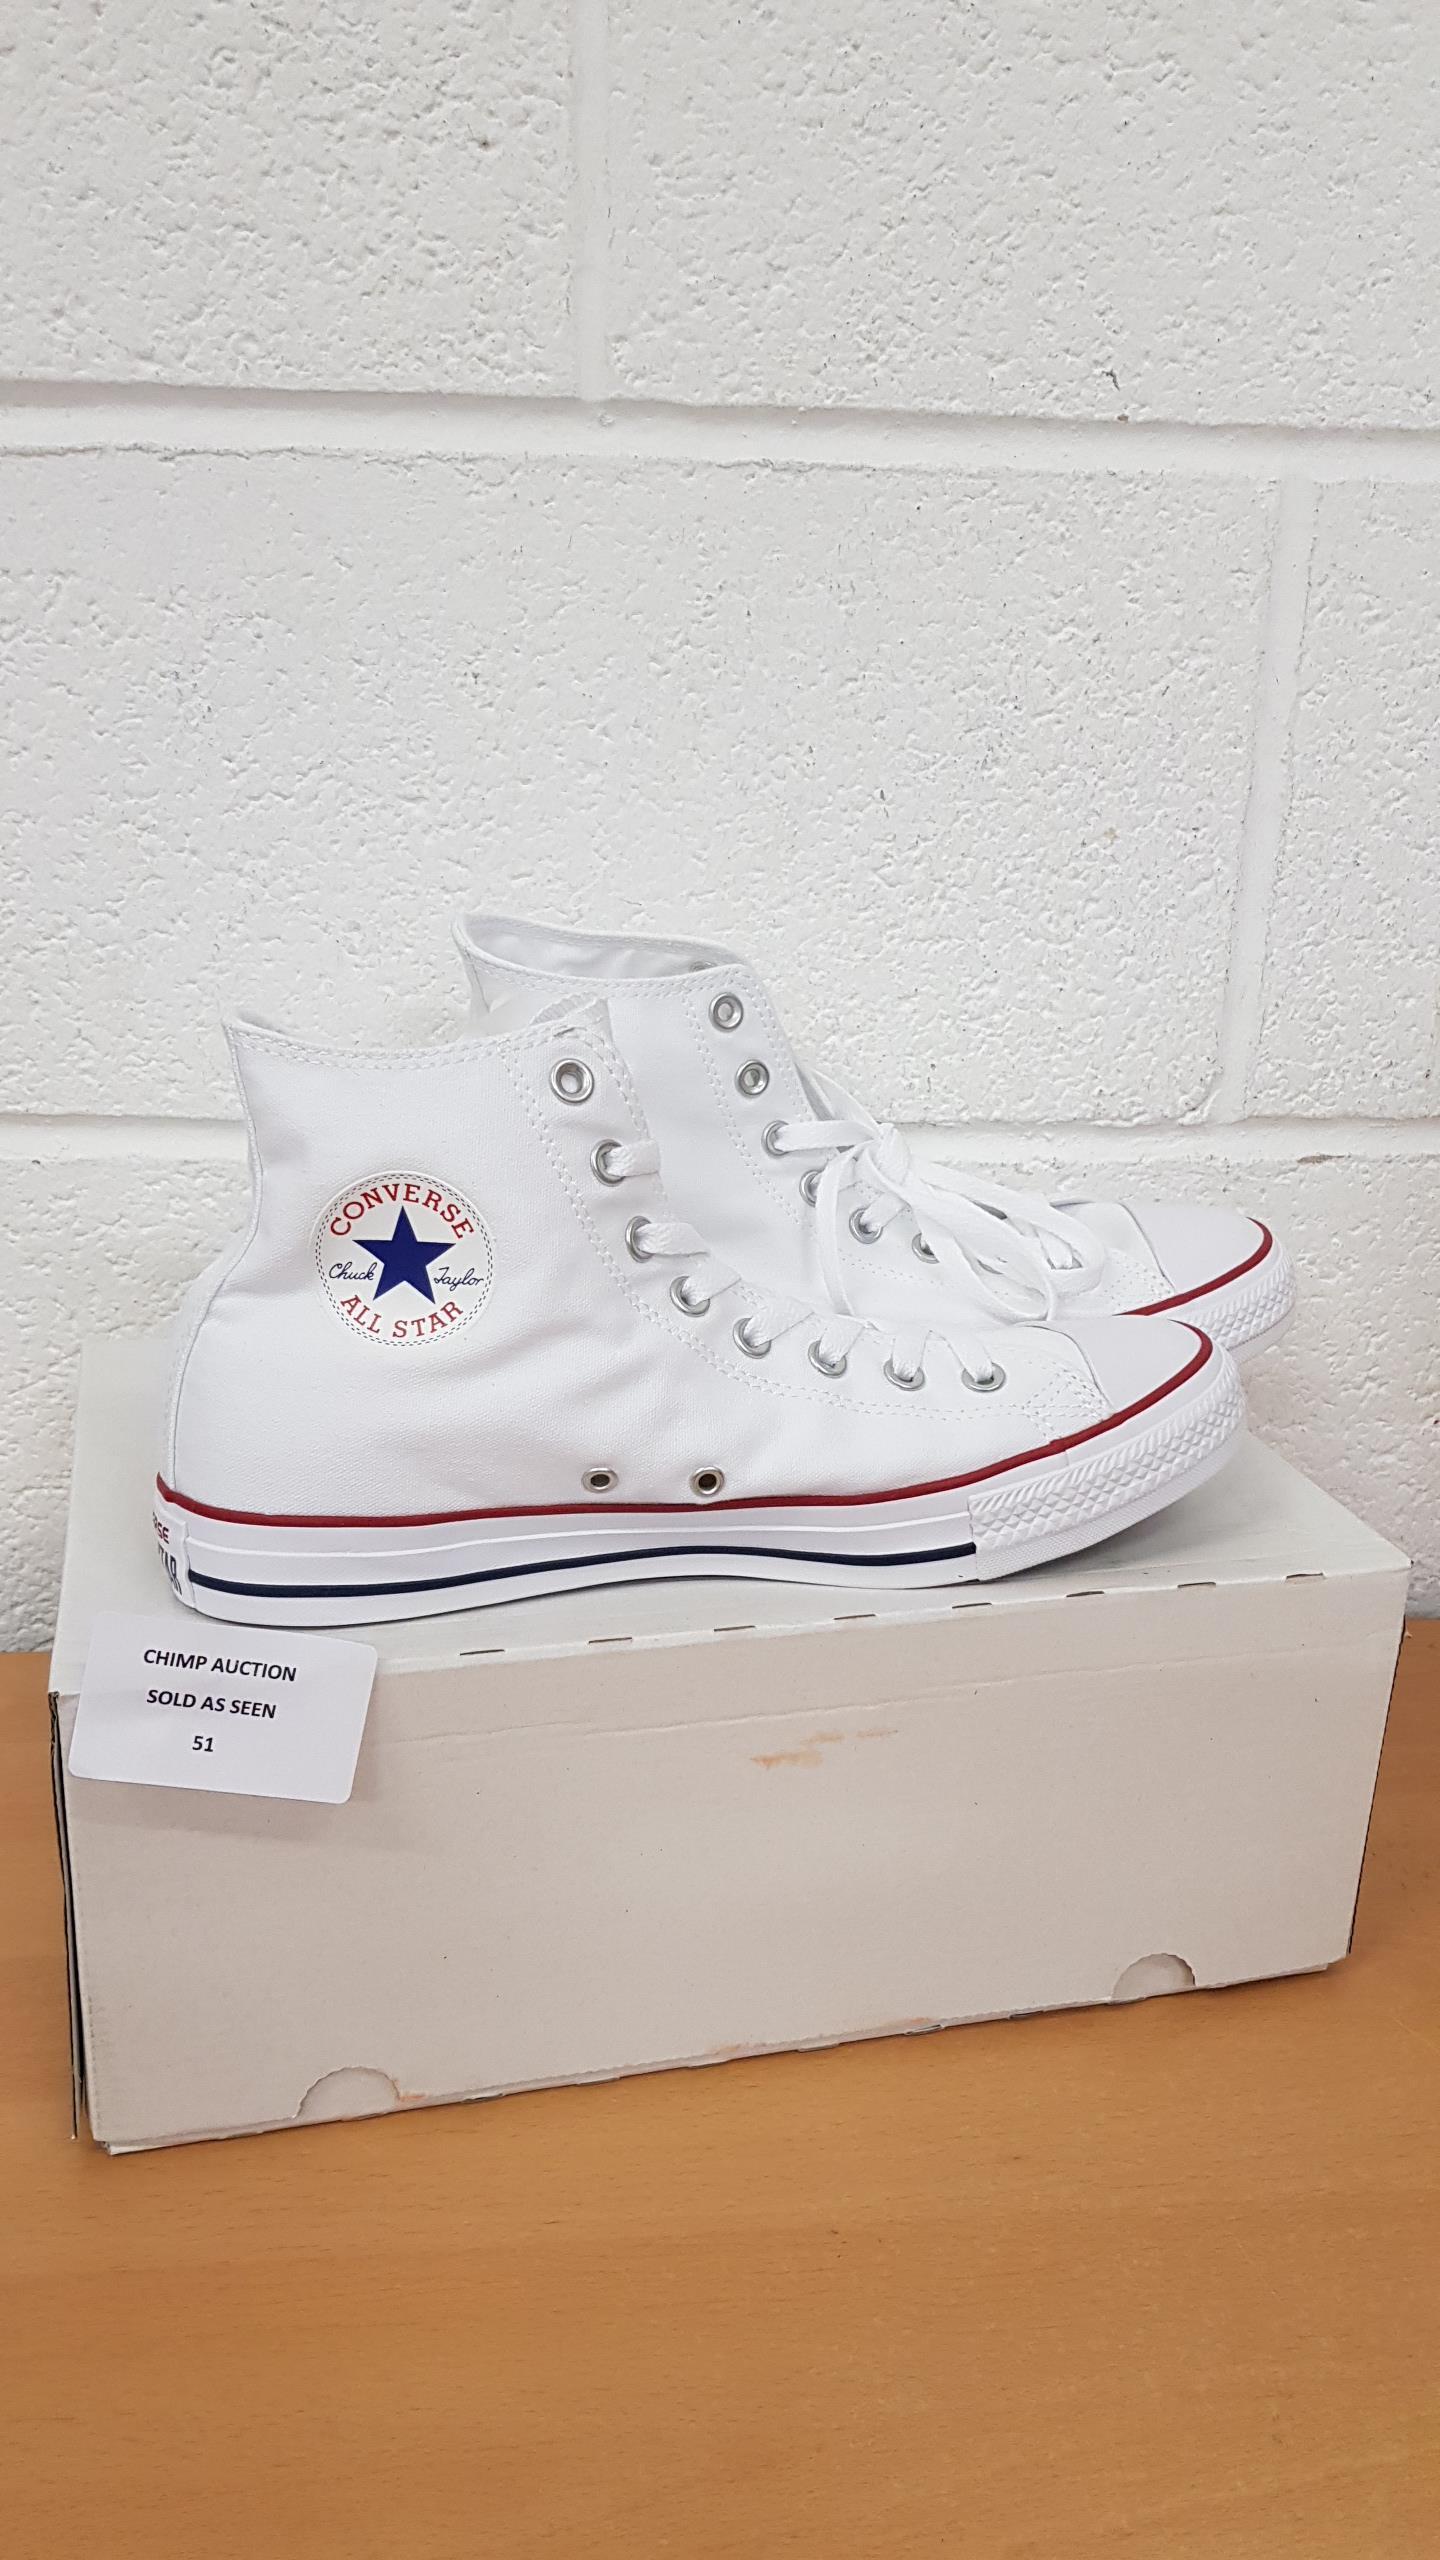 Lot 51 - Converse All stars unisex shoes UK 9